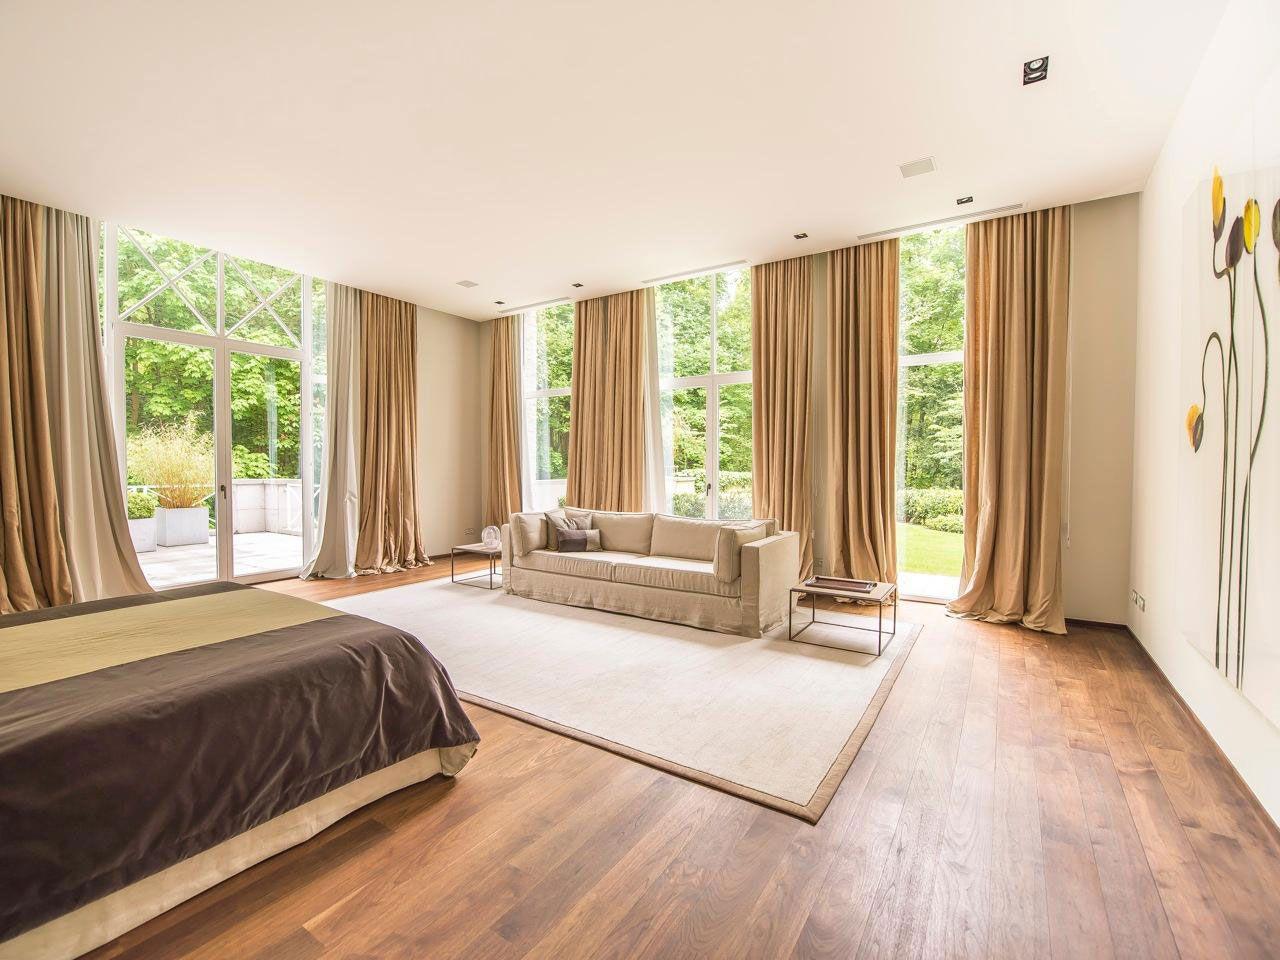 Chic Elegant Apartment in Brussels With Bright Interiors-16